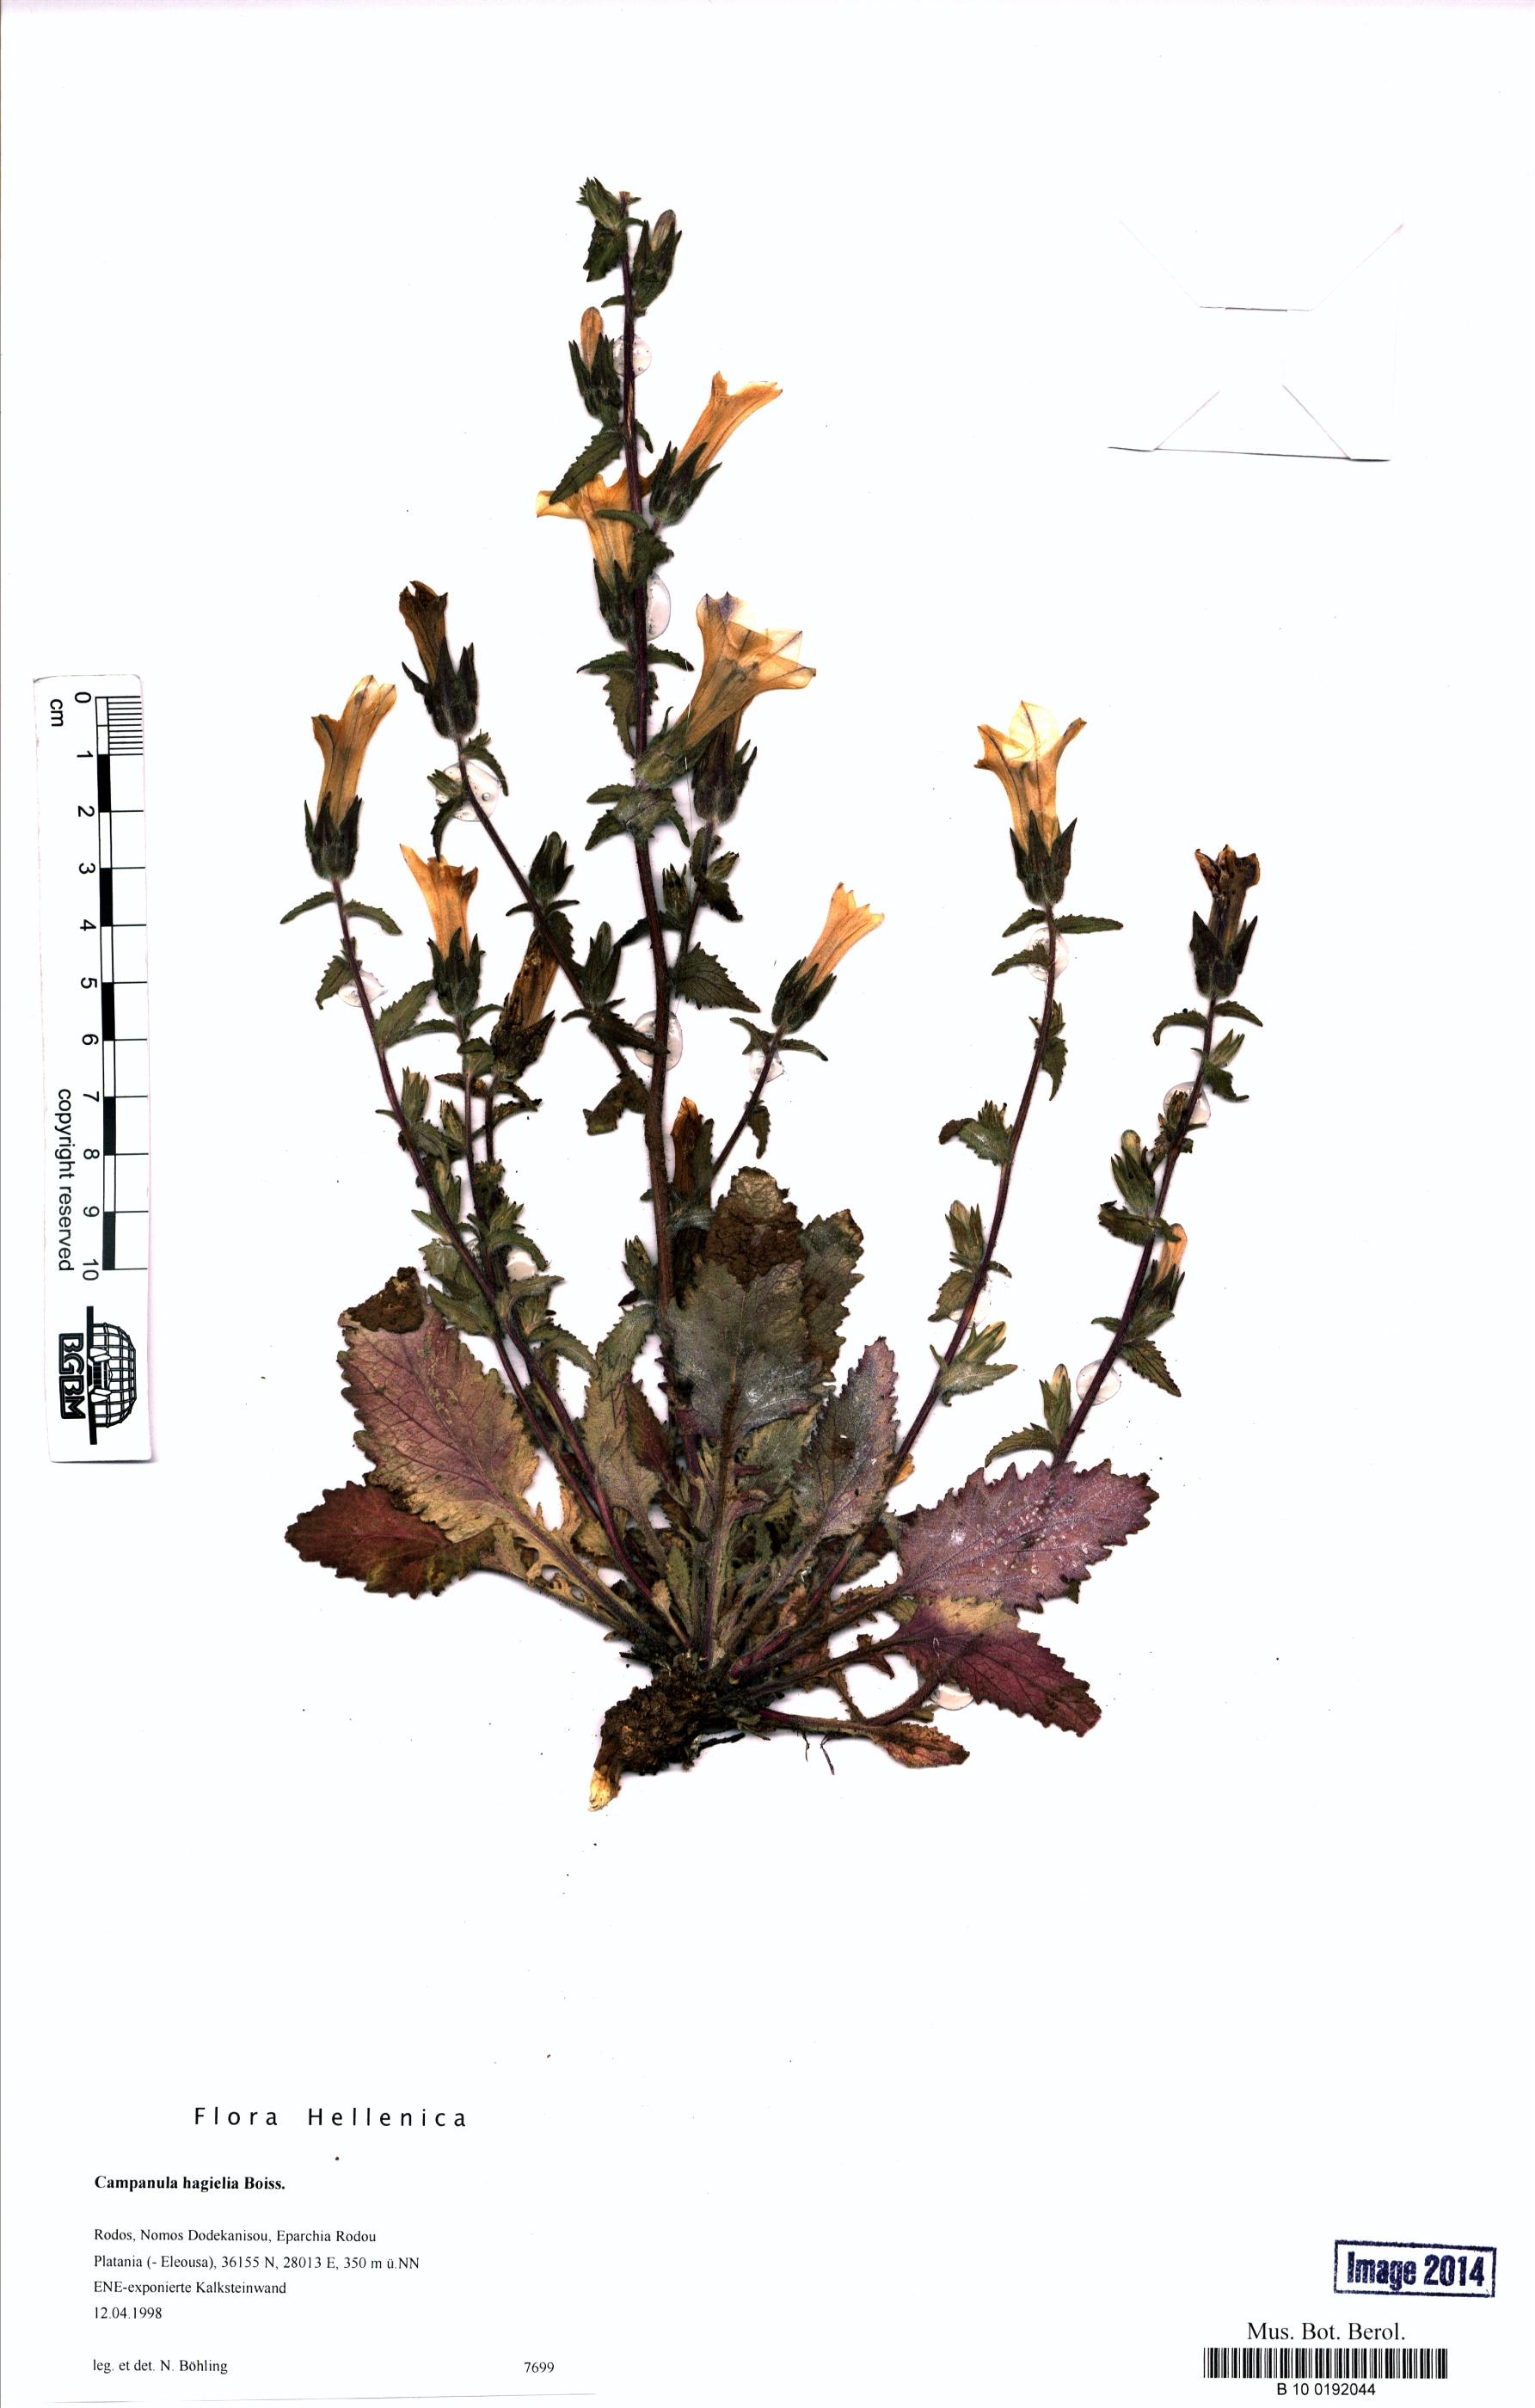 http://ww2.bgbm.org/herbarium/images/B/10/01/92/04/B_10_0192044.jpg